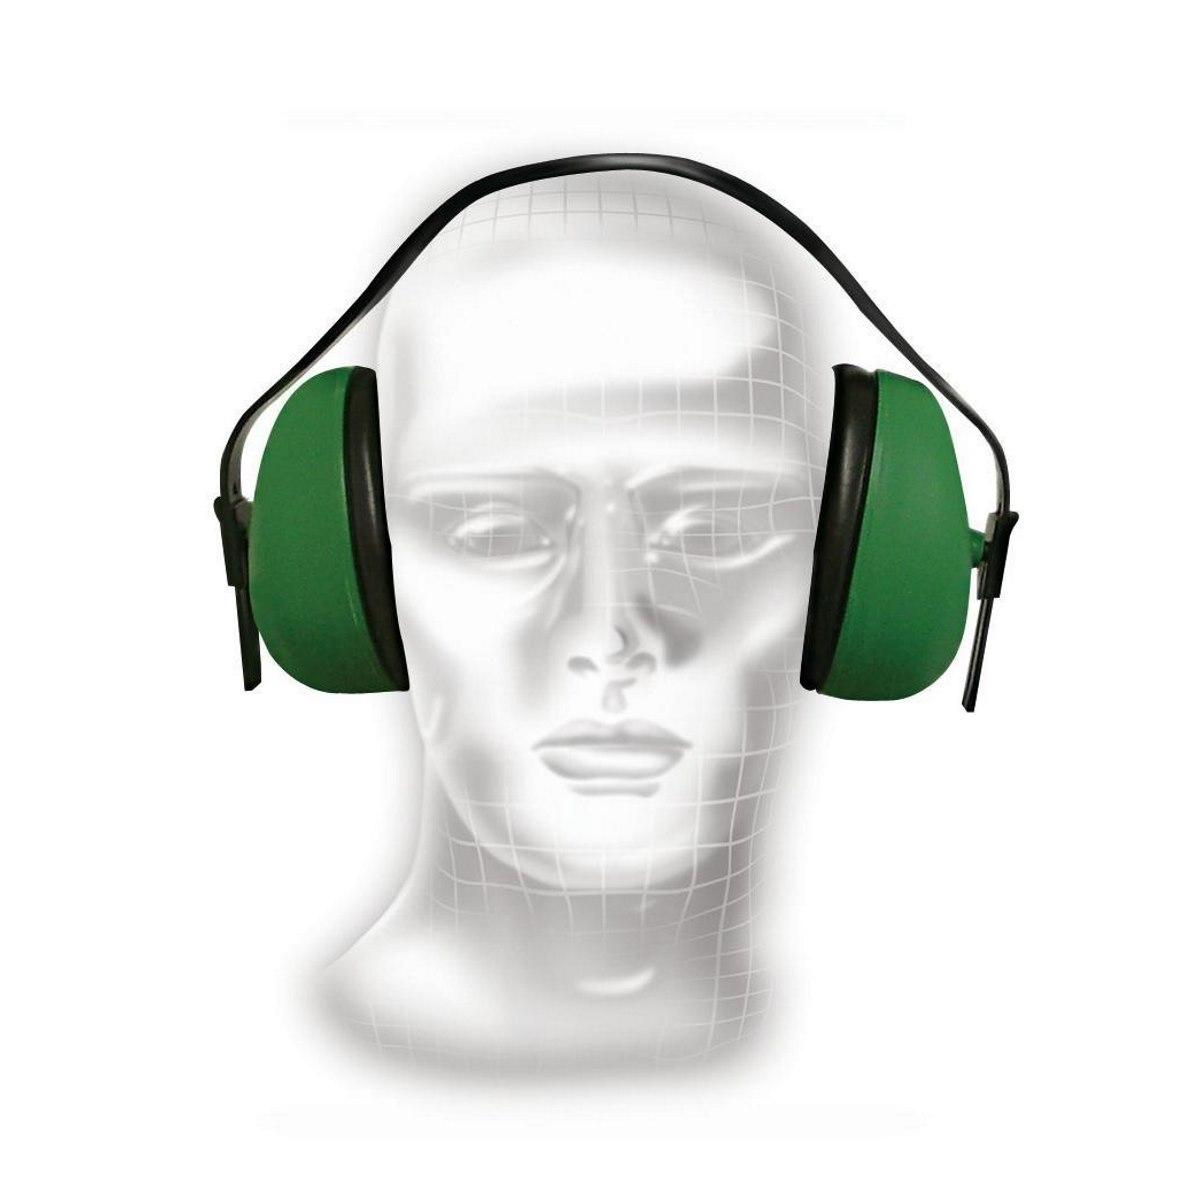 HP6100 Noisebeta Standard Ear Muff SNR 27